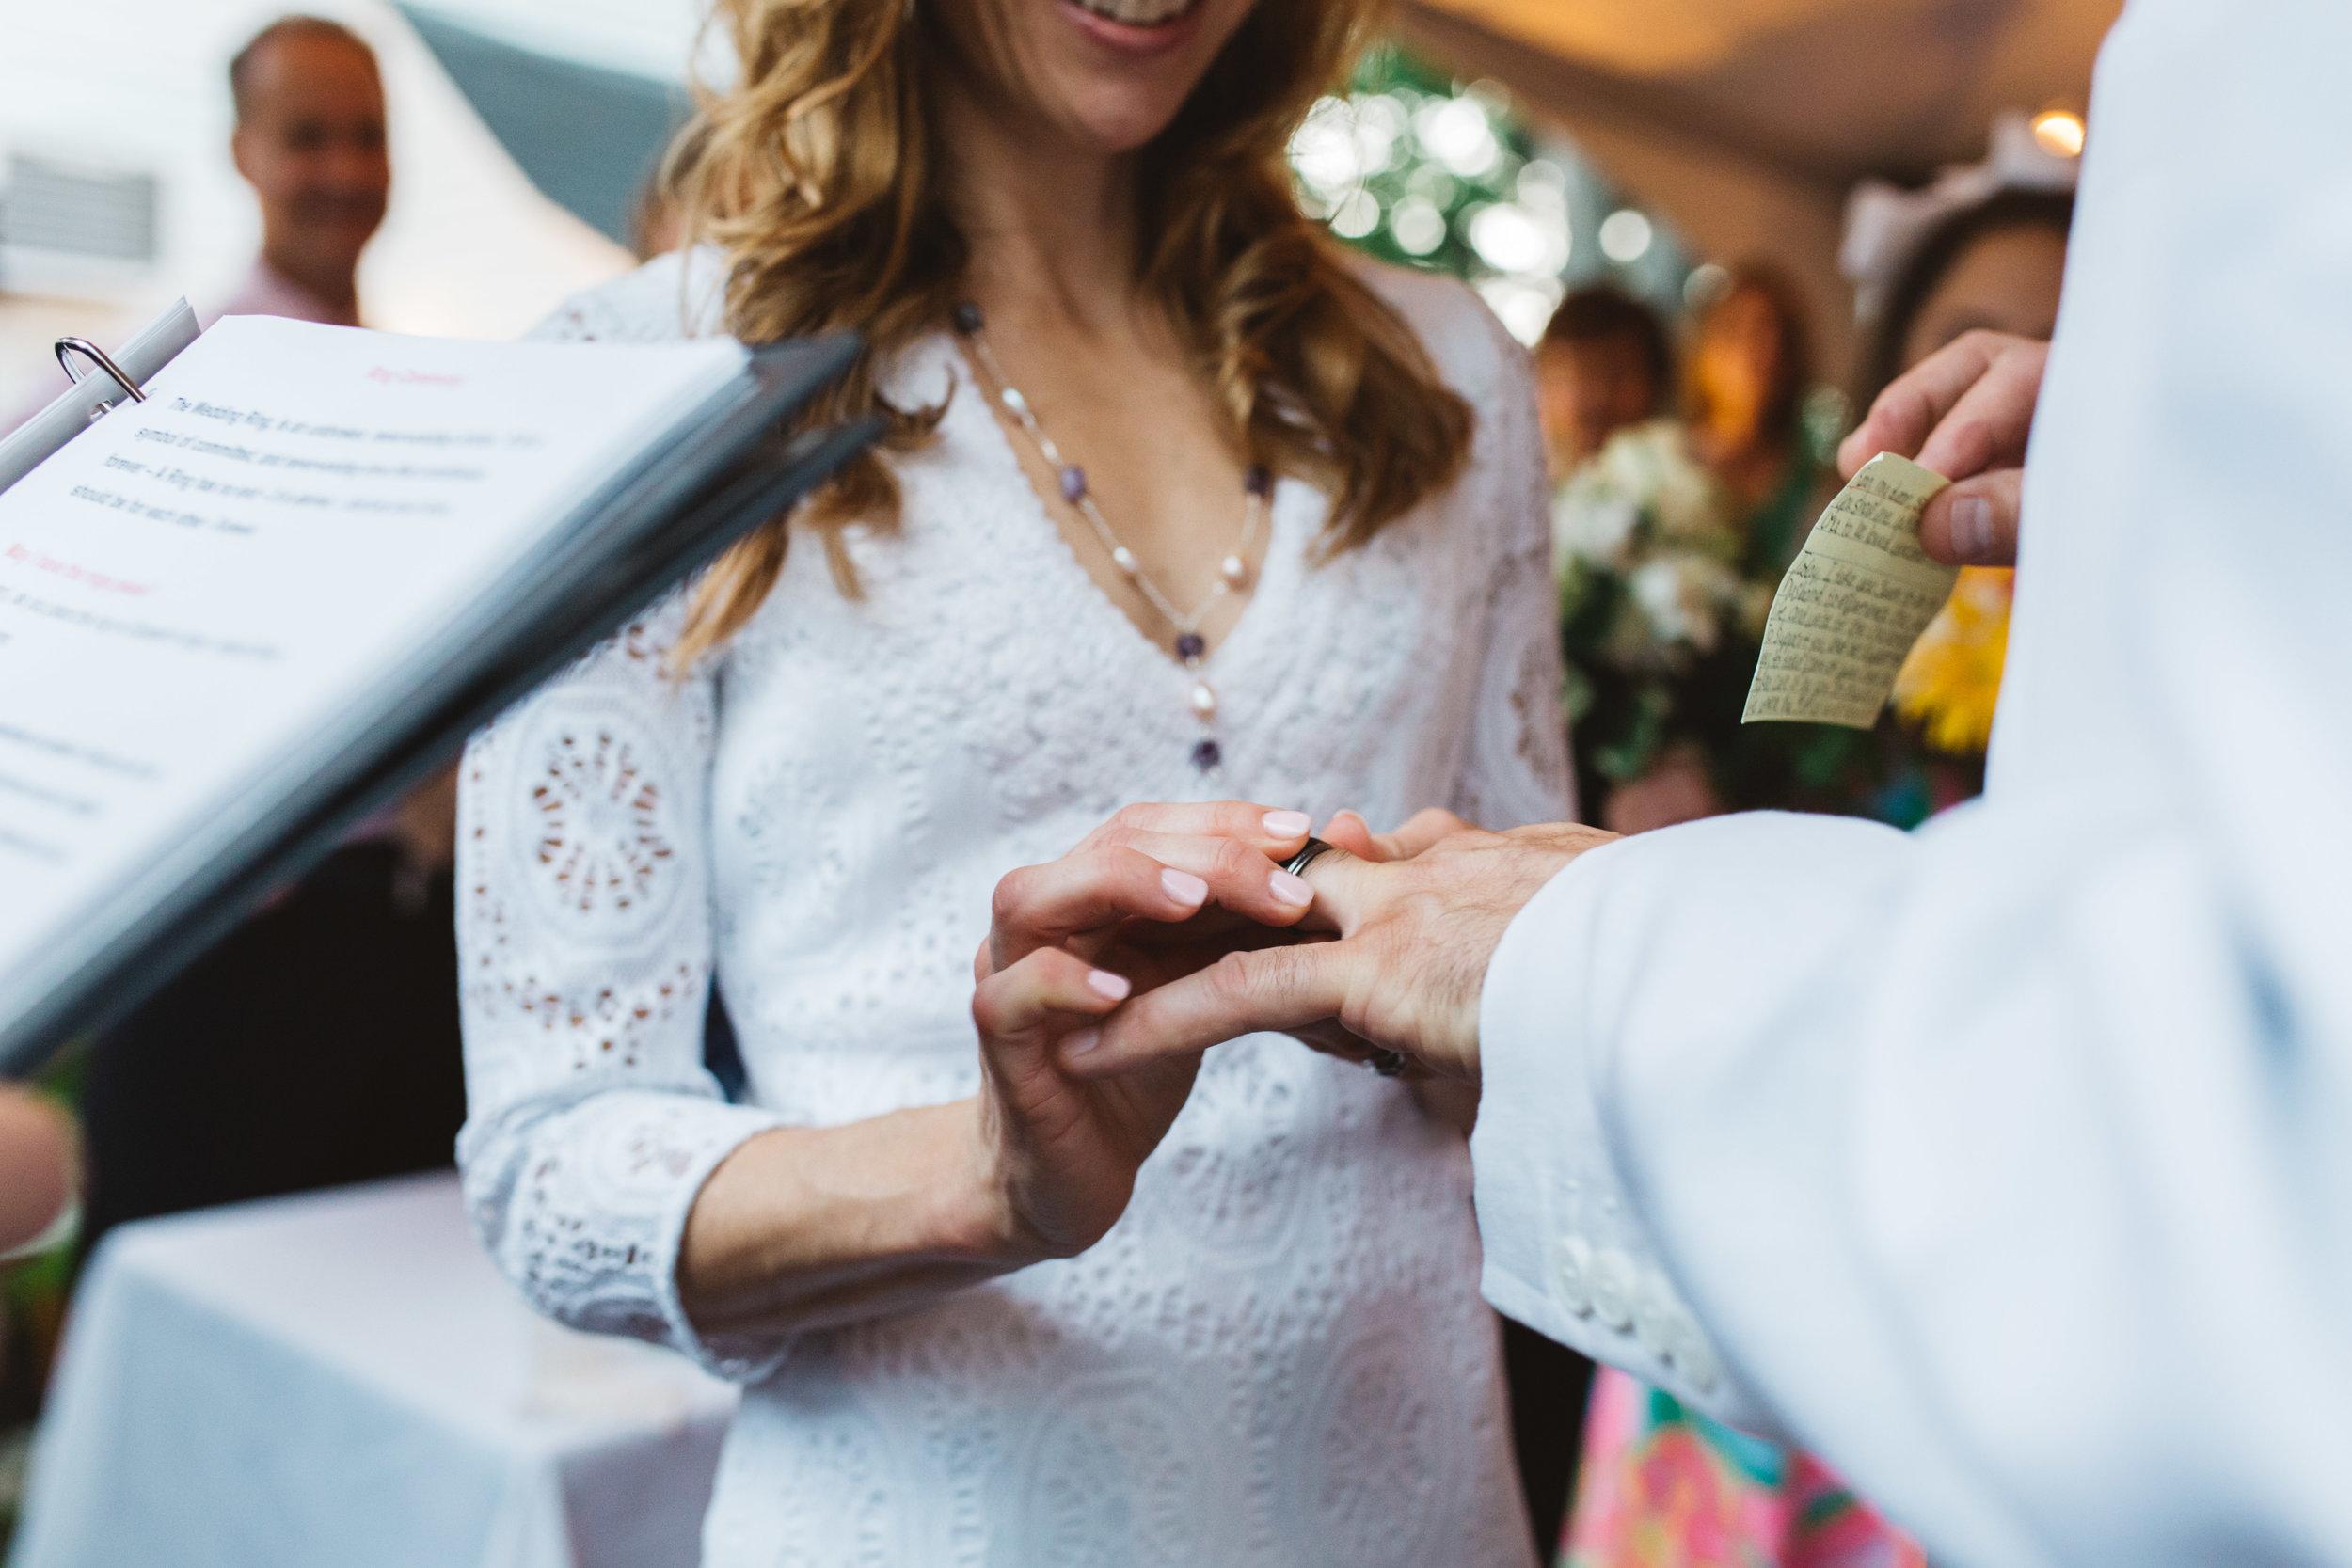 Exchanging wedding bands - Elizabeth and Sean's intimate Attleboro wedding ceremony